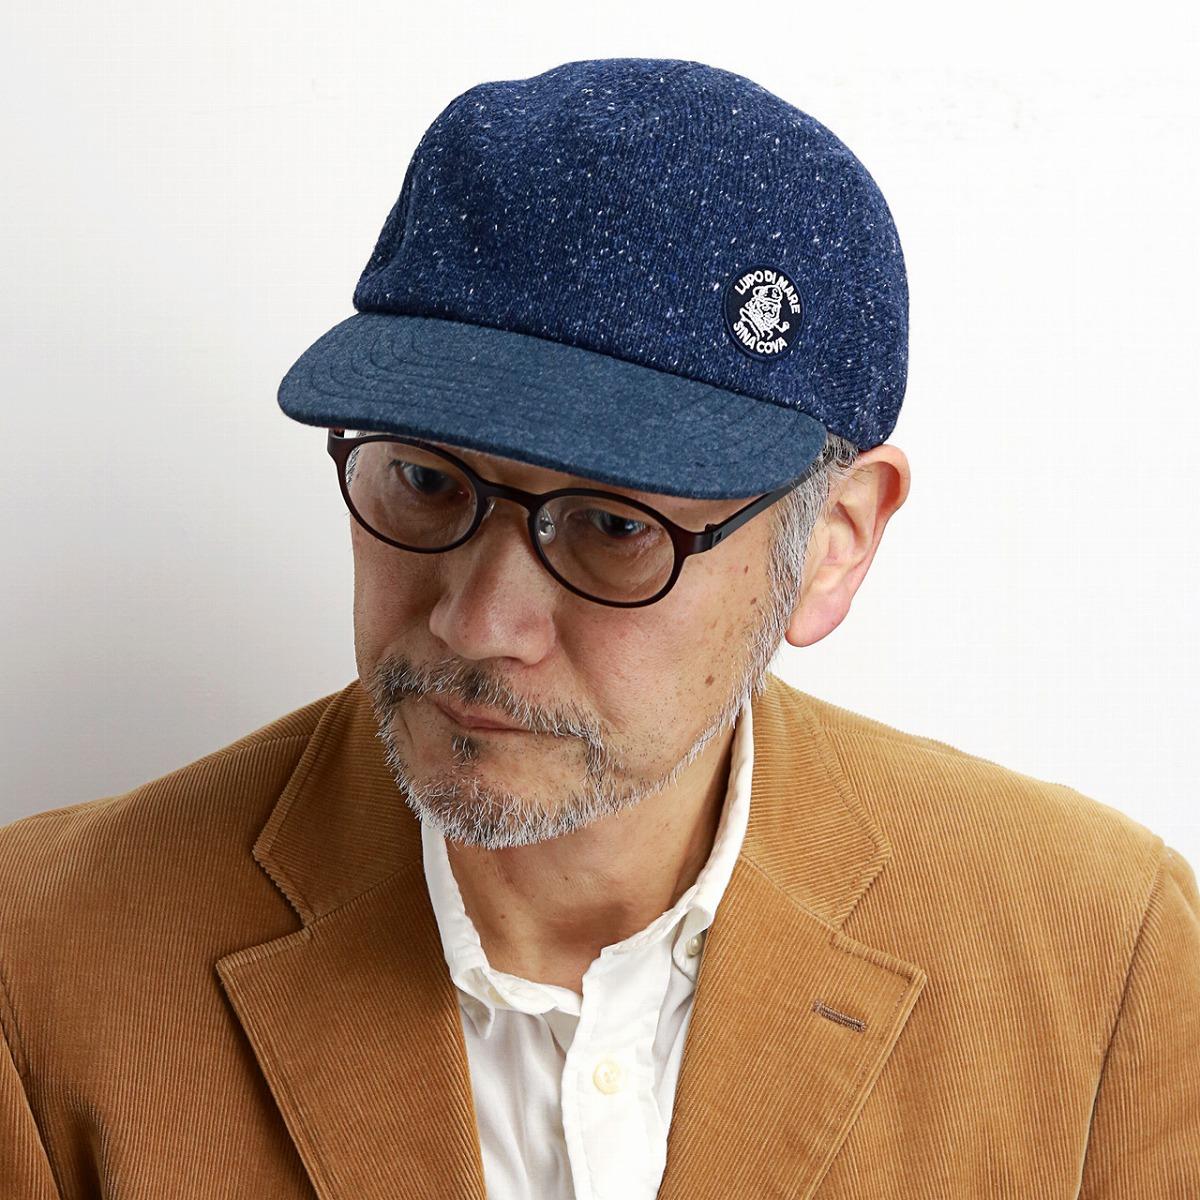 4983c345 ELEHELM HAT STORE: The cap men sicacova hat check Viyella raised NEP knit  CAP winter material logo mark Malin coordinates Malin buran super-sadist M  L ...